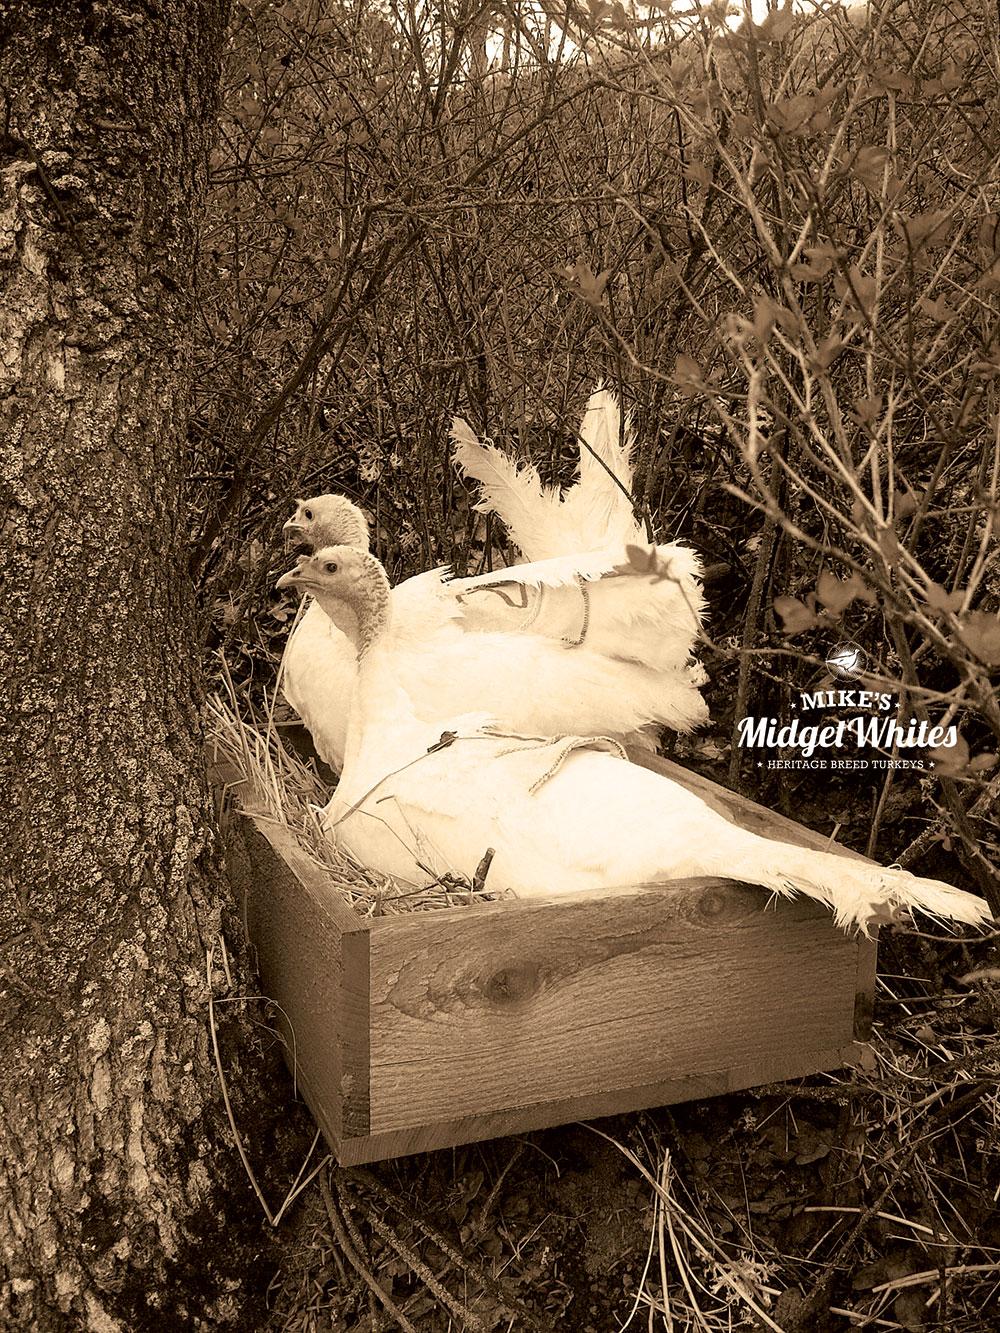 Mikes-Midget-White-Turkey-Hens-Nesting-in-Tree.jpg